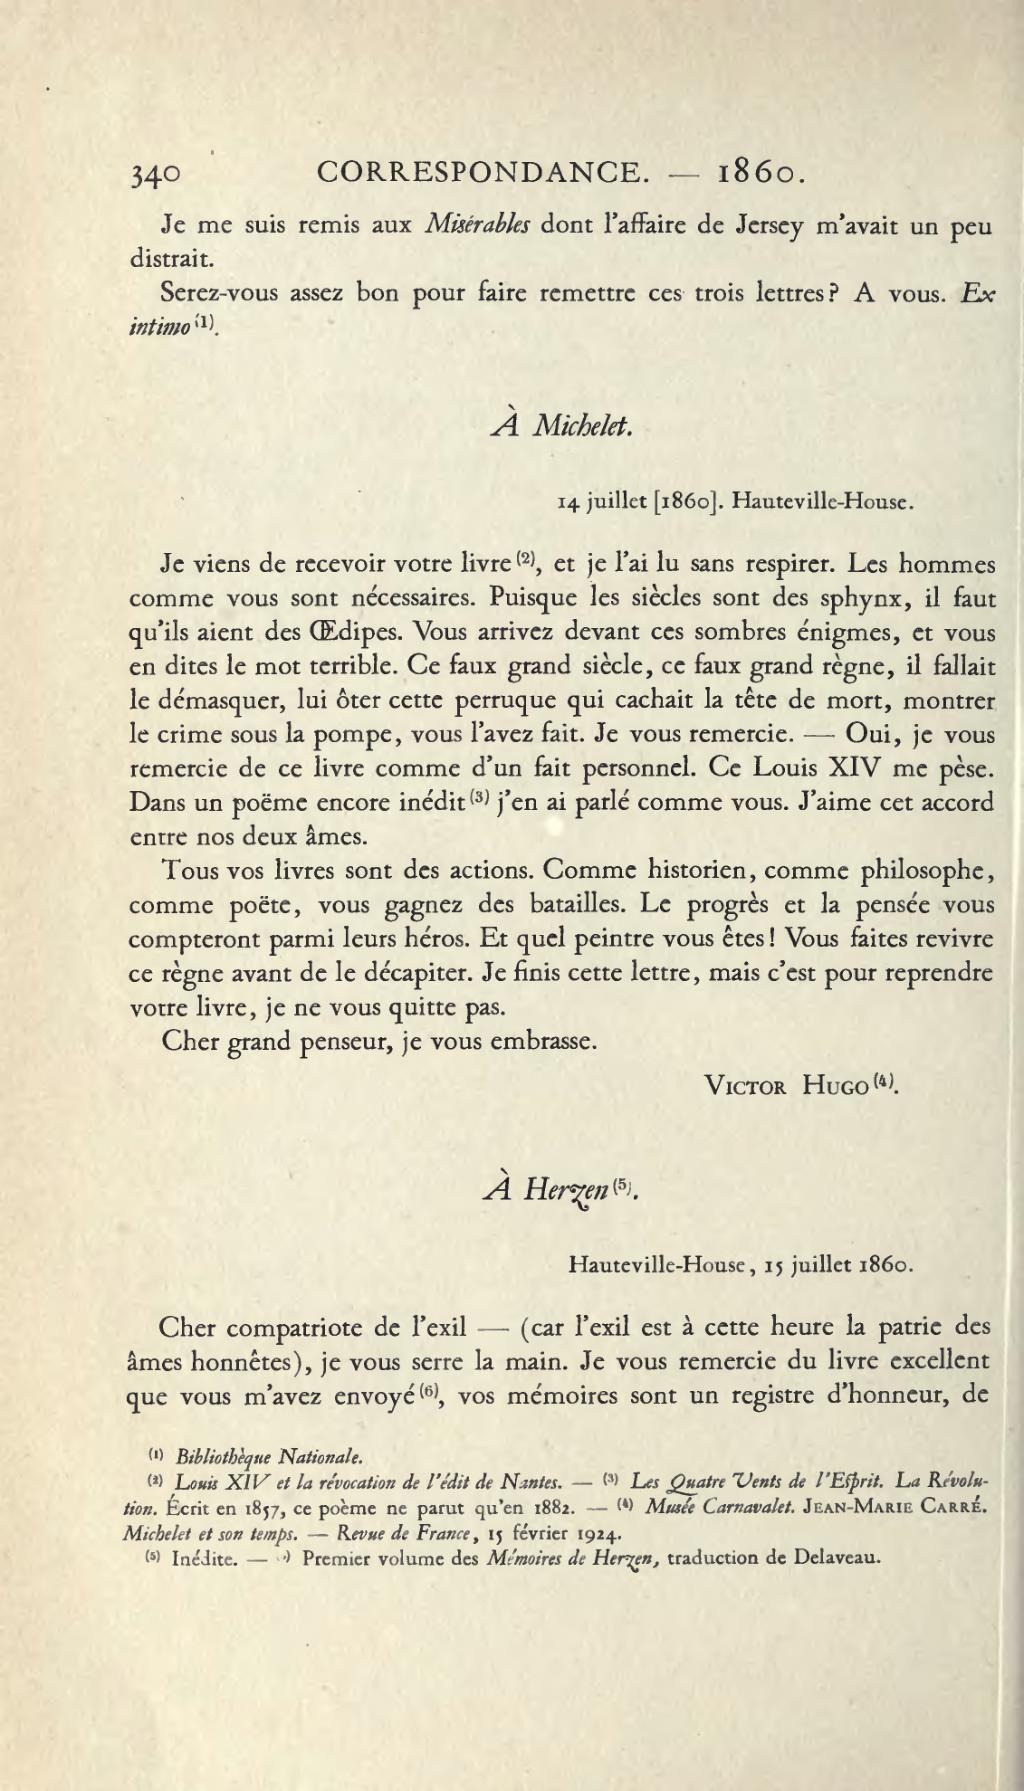 Pagehugo œuvres Complètes Impr Nat Correspondance